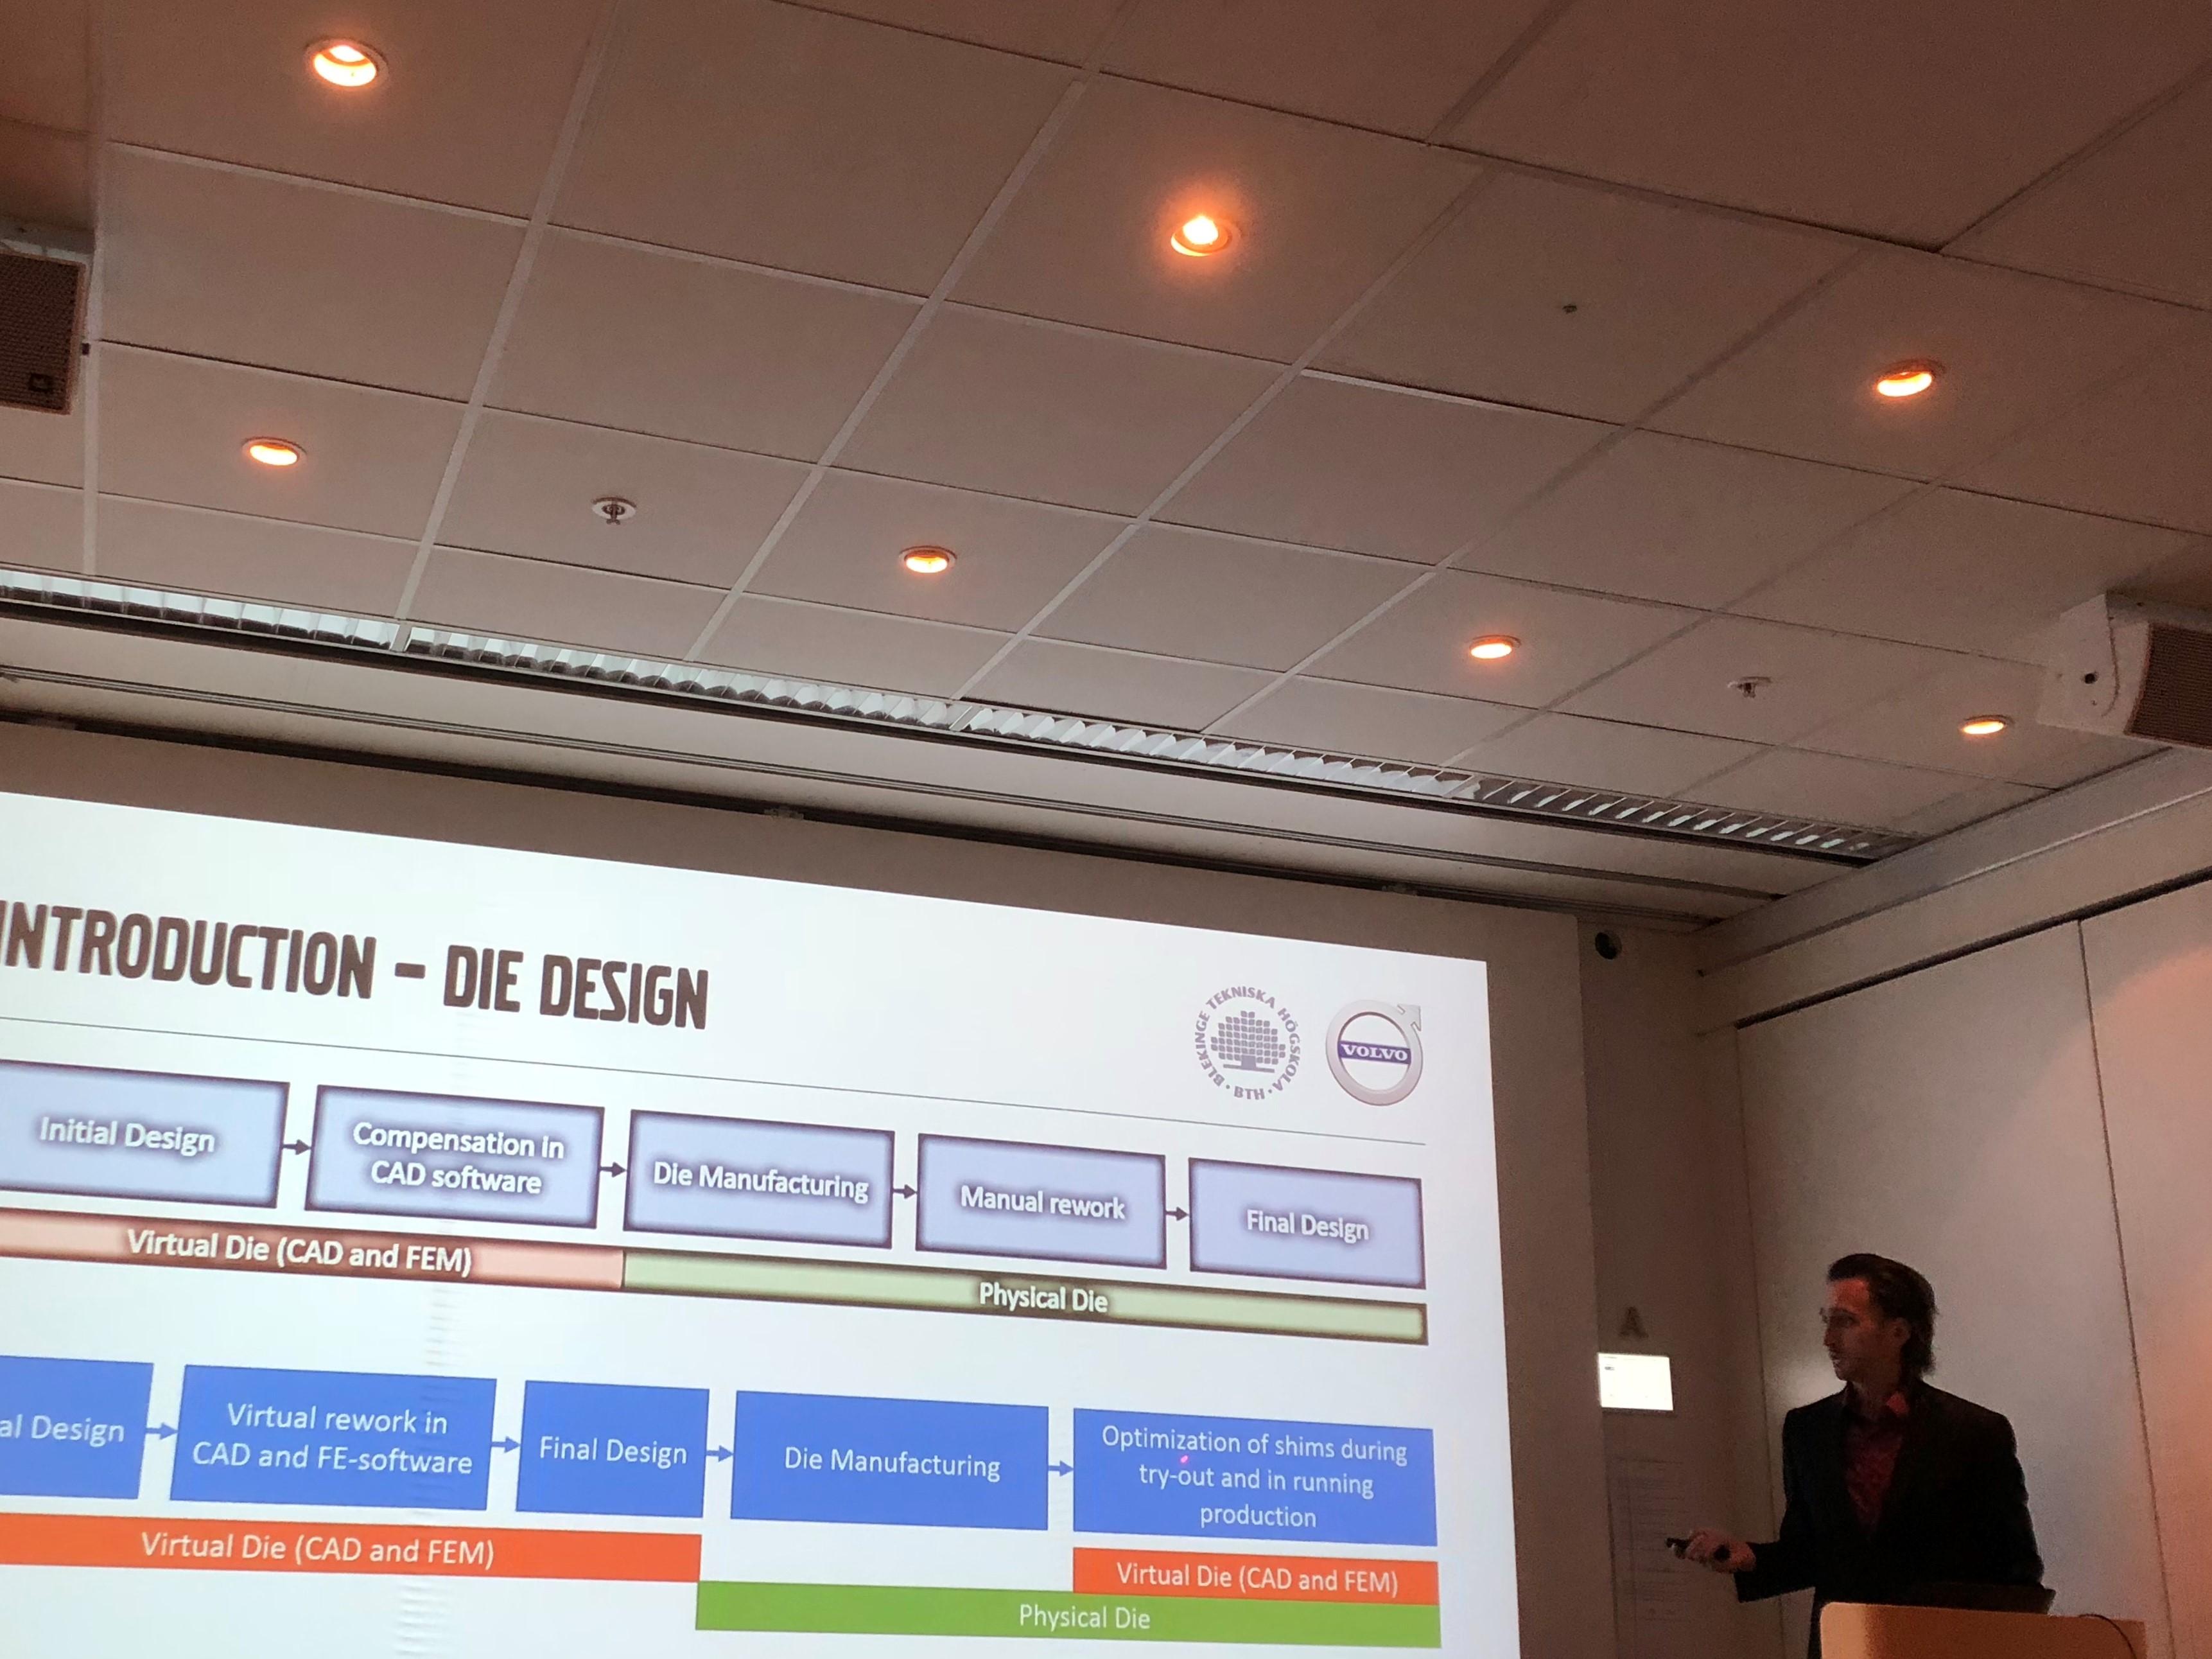 Photo from Johan Pilthammar presentation at Volvo Cars